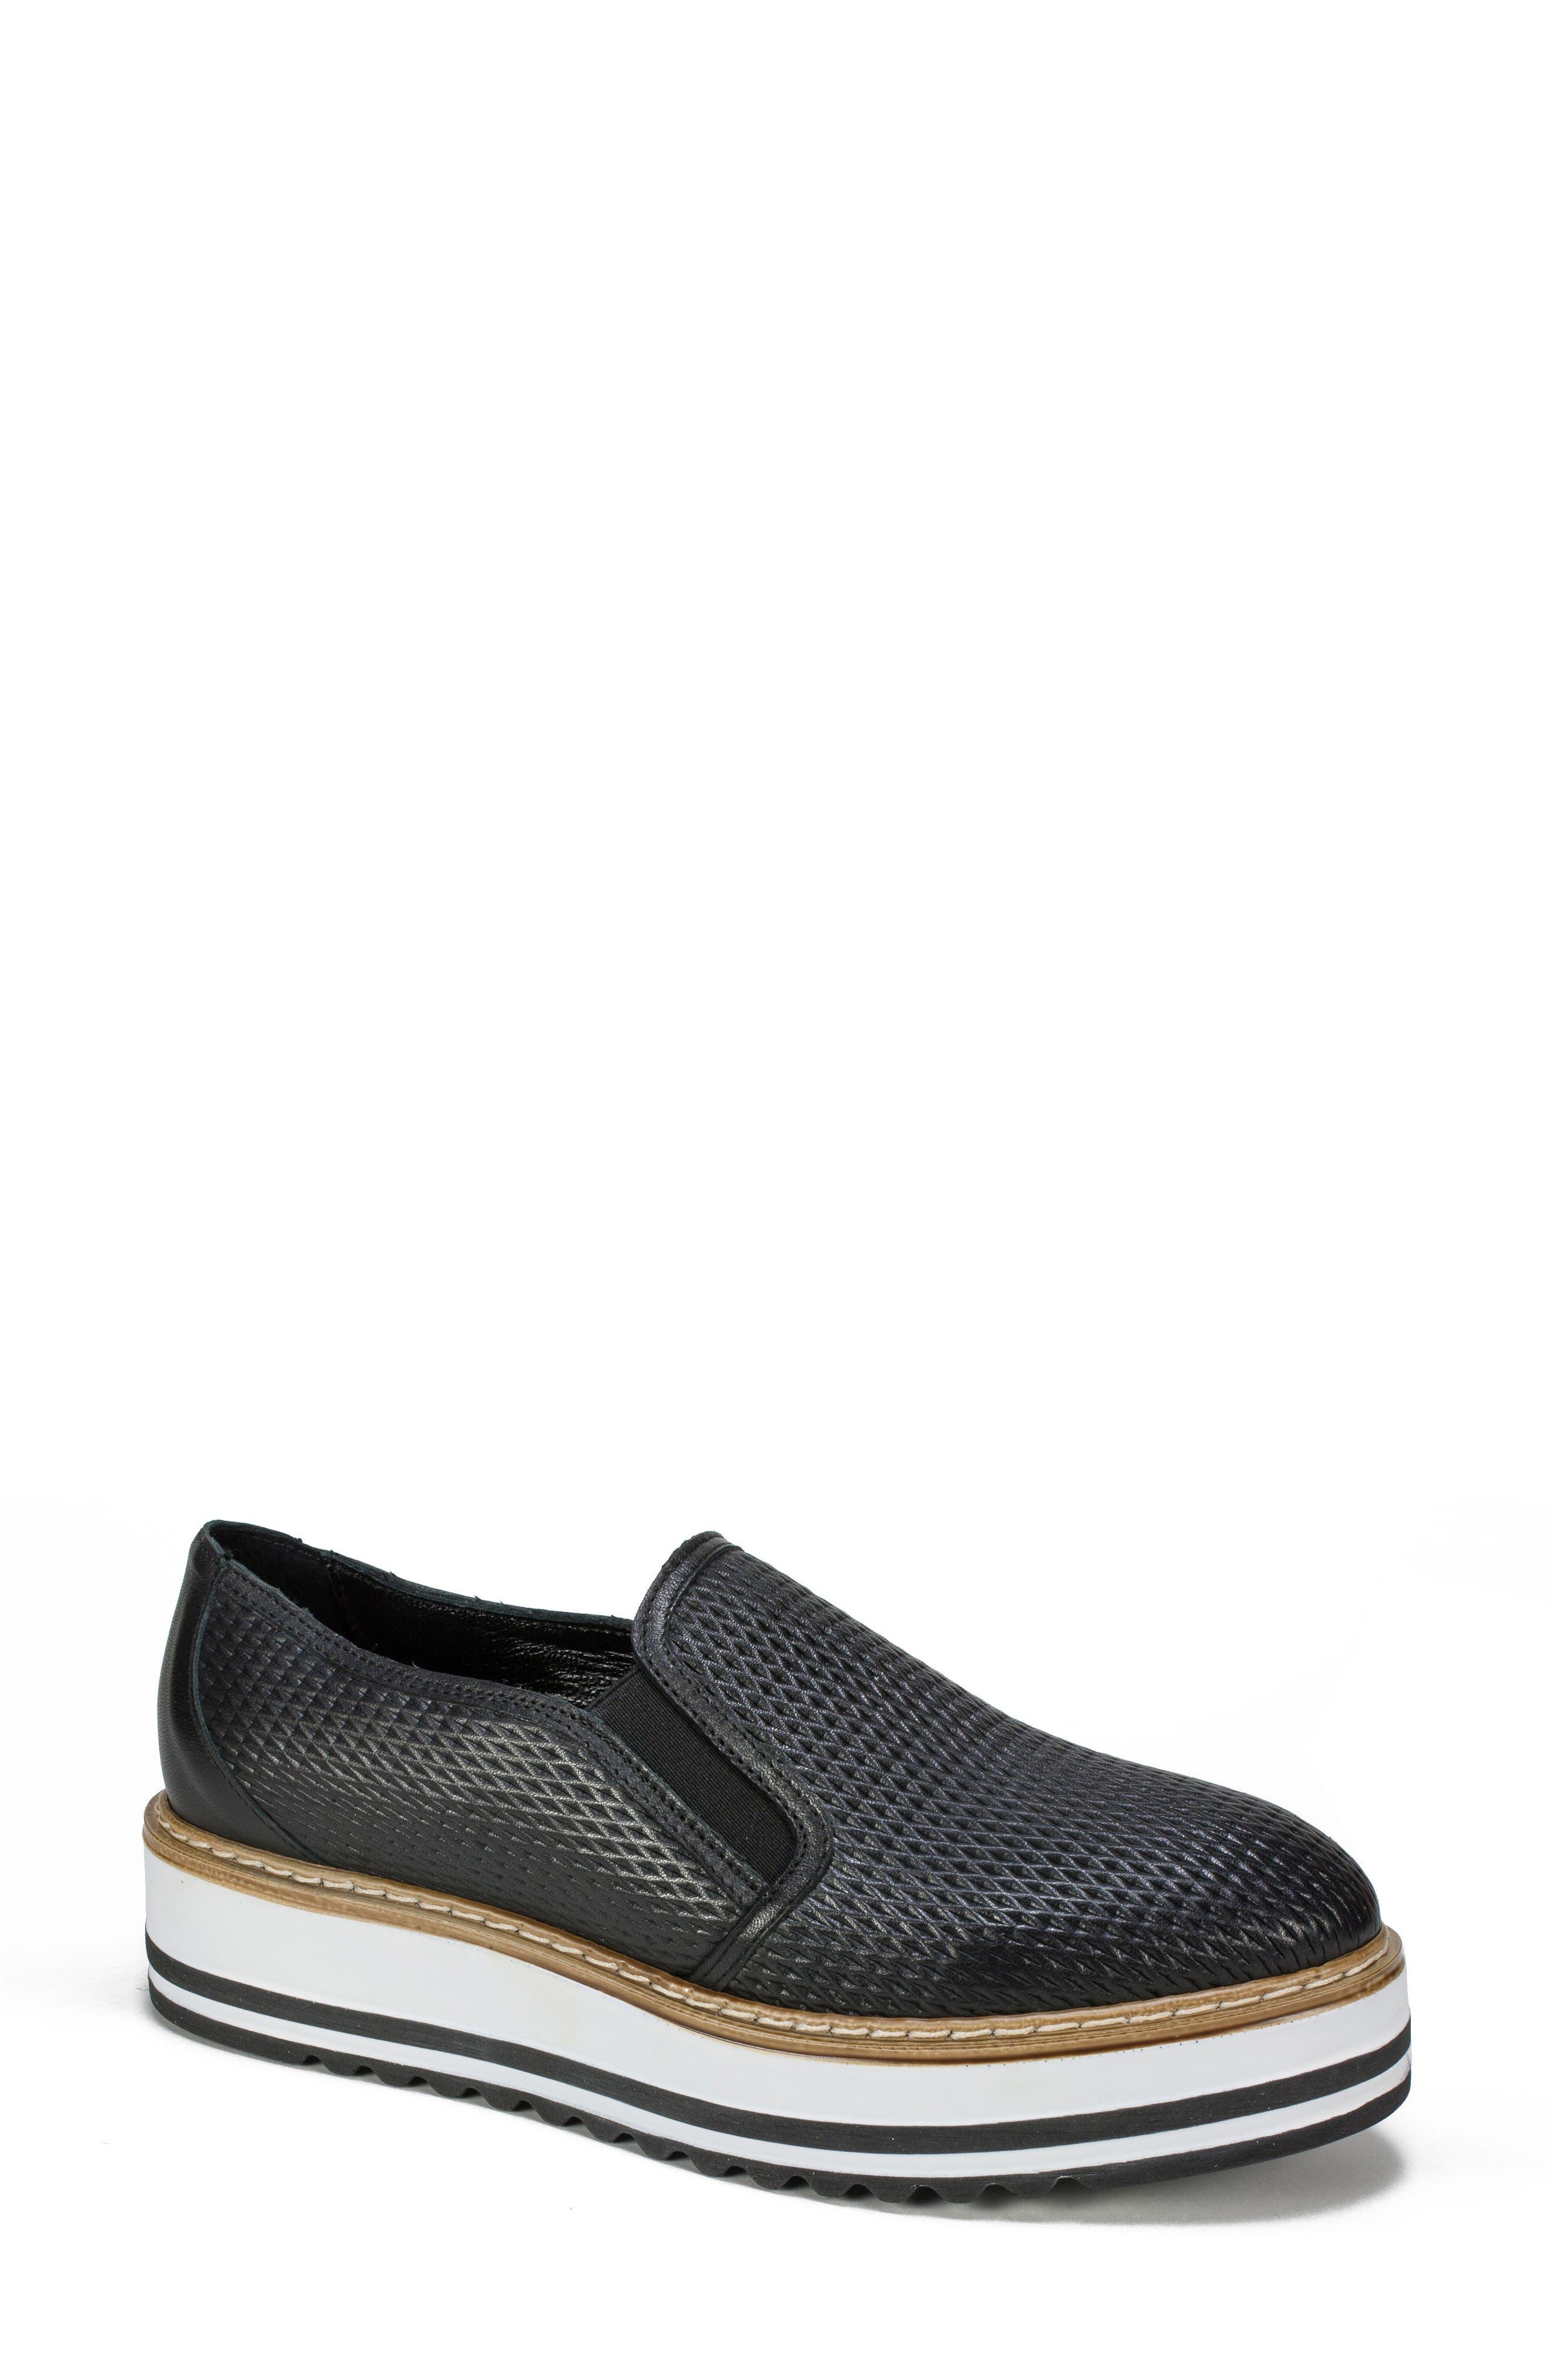 Belton Platform Slip-On,                             Main thumbnail 1, color,                             Black Textured Leather